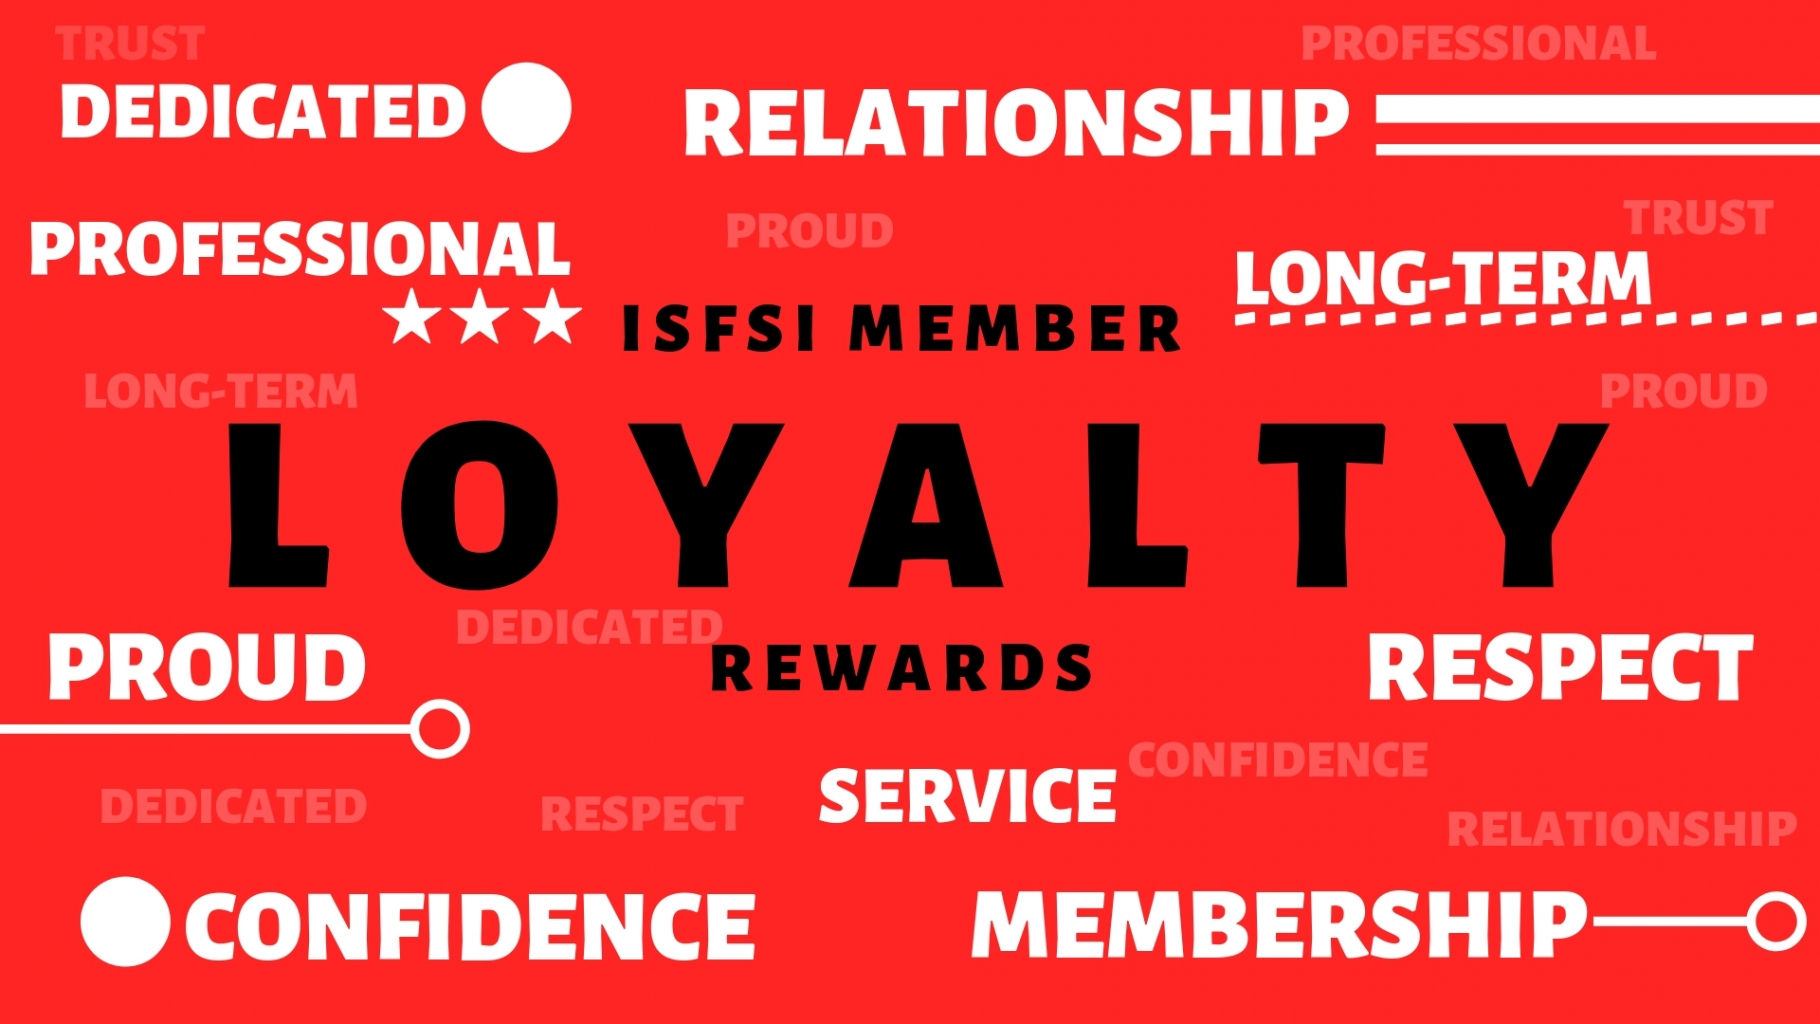 Loyalty Rewards Program >> Isfsi Member Loyalty Reward Program